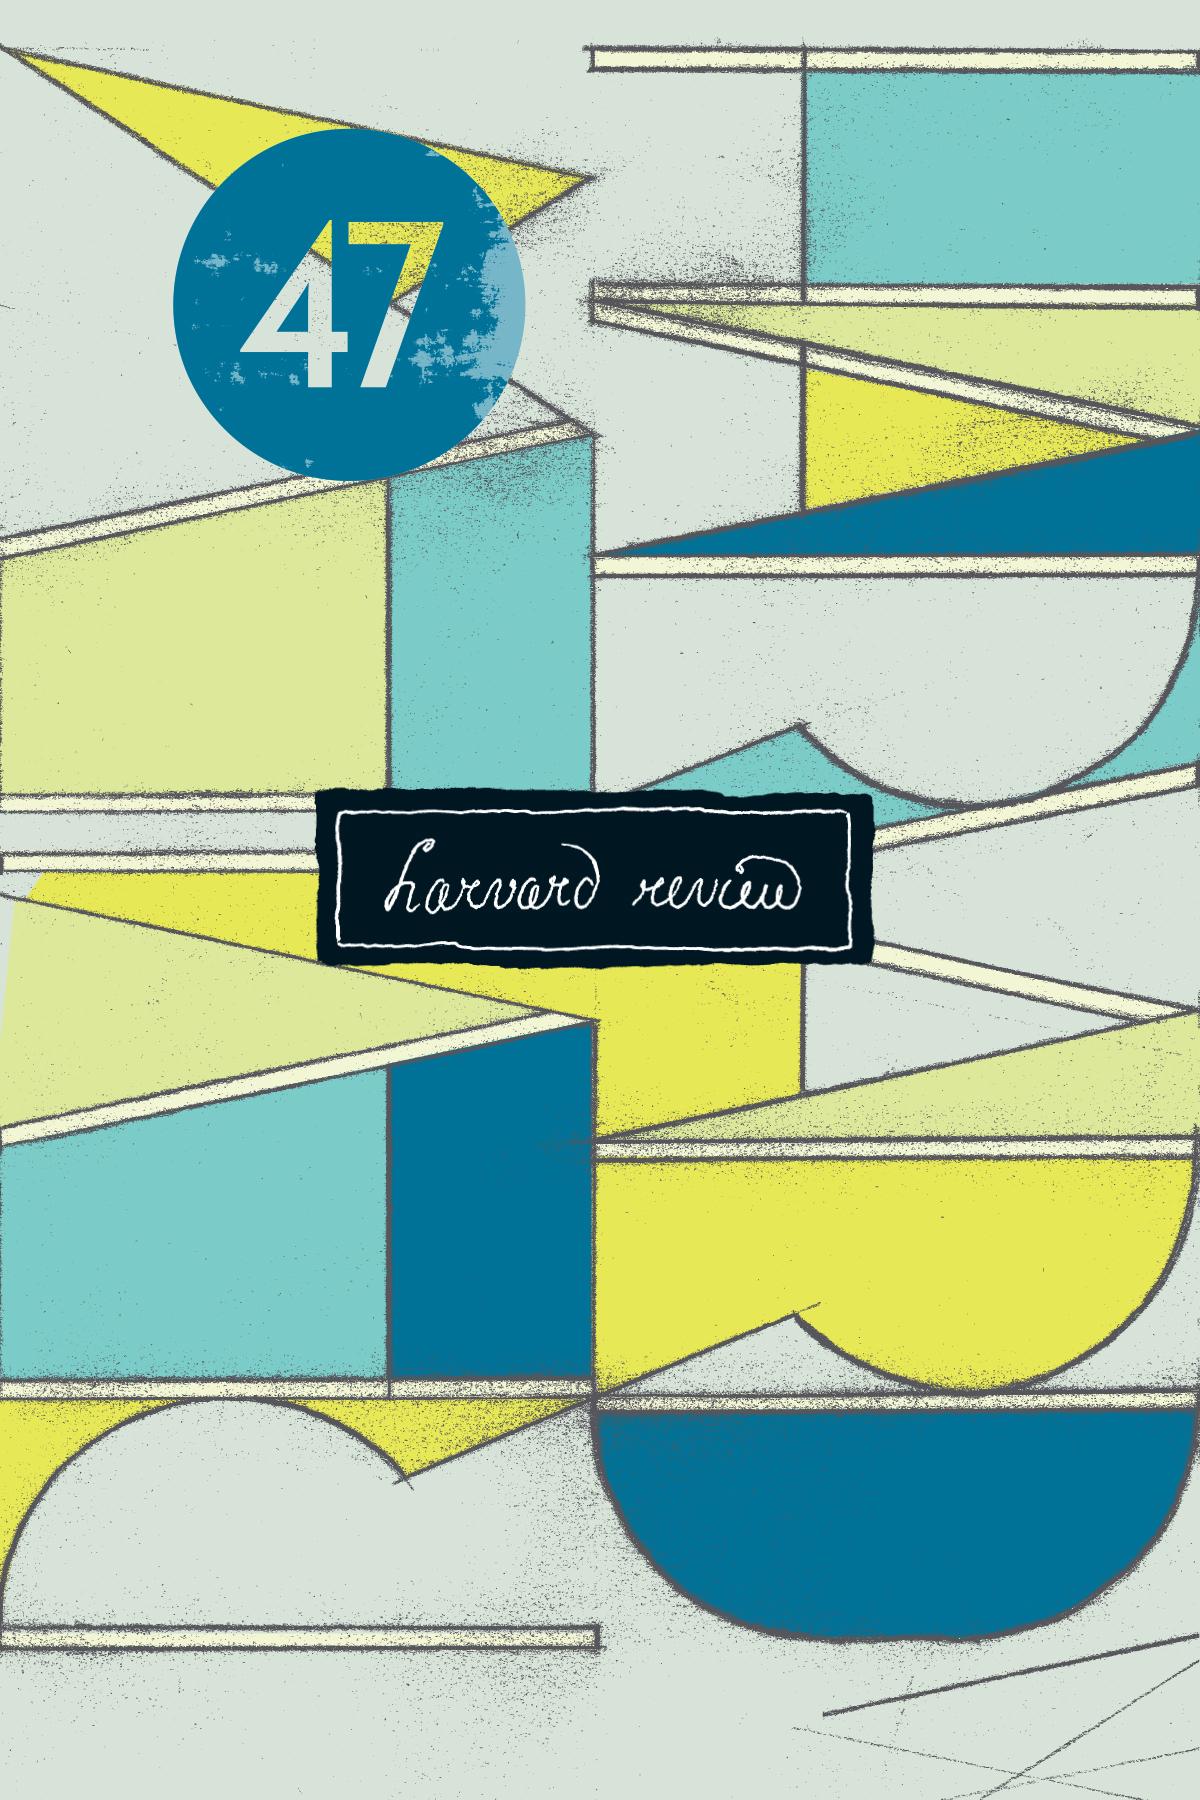 Harvard Review 47 Cover